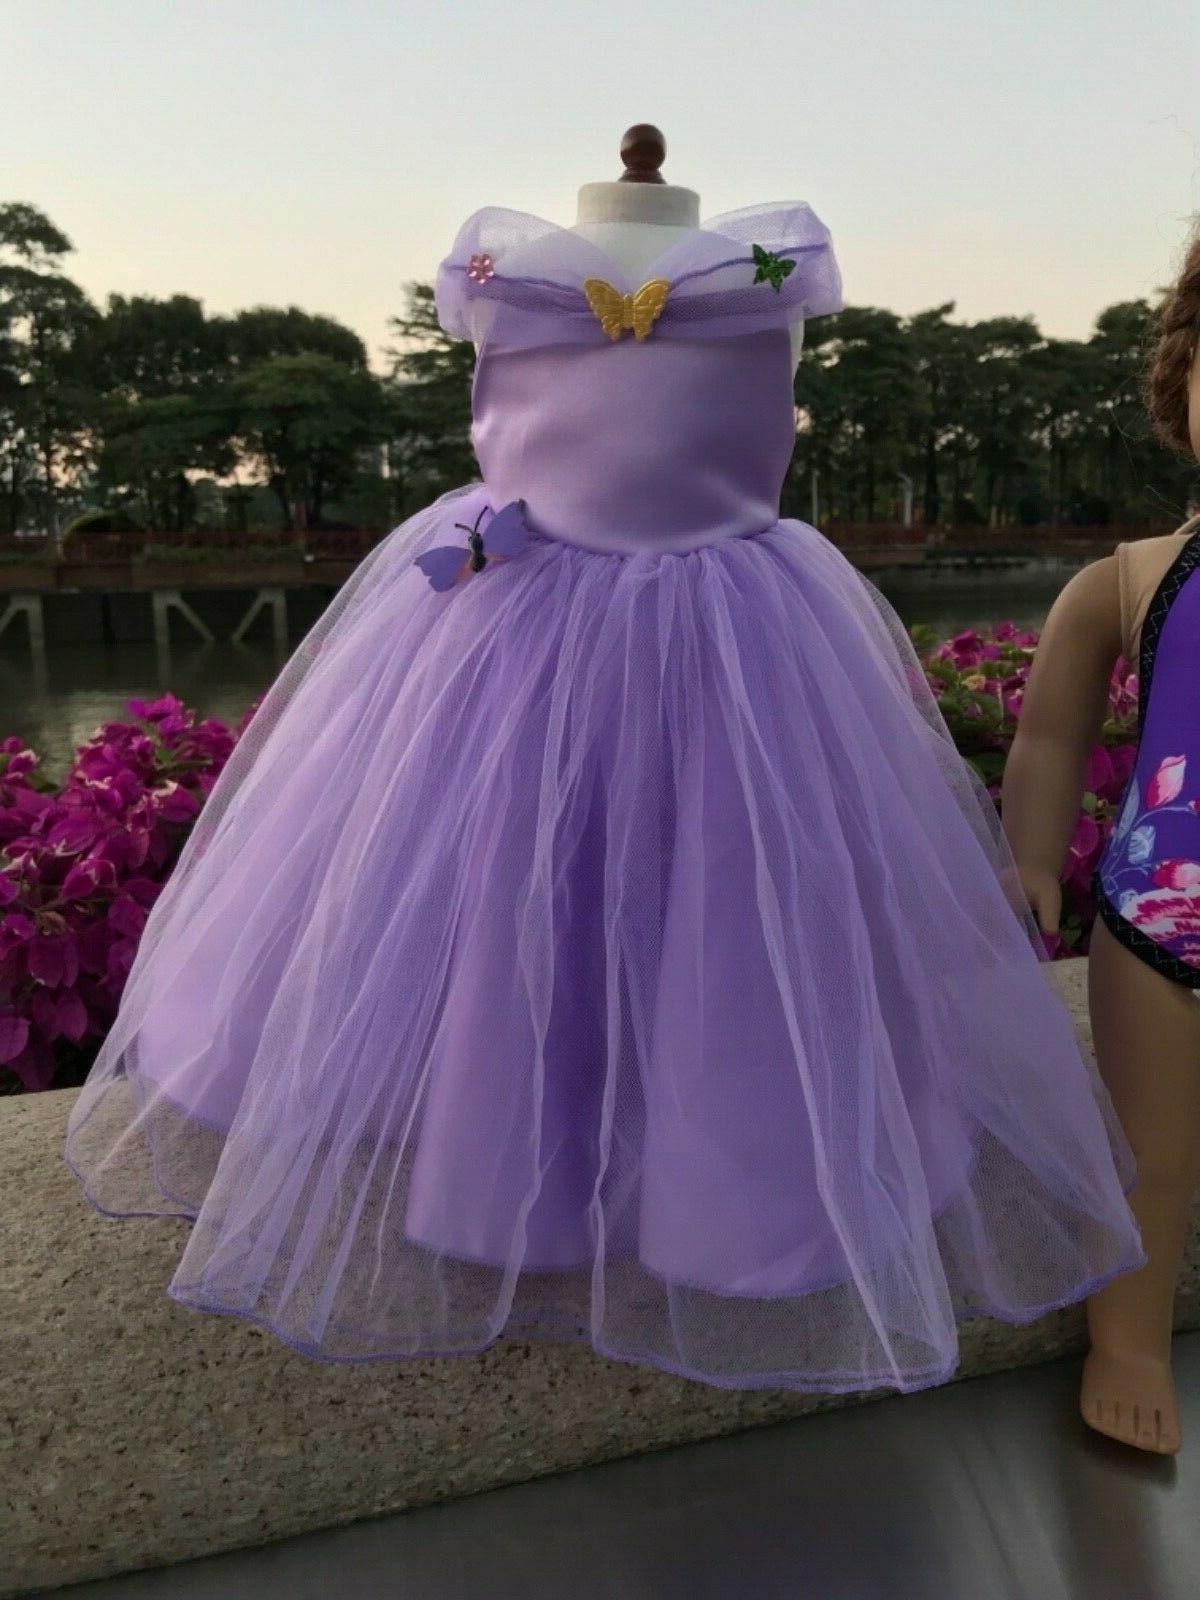 "Doll dress Swimwear girl 18"" doll clothes 2pc"